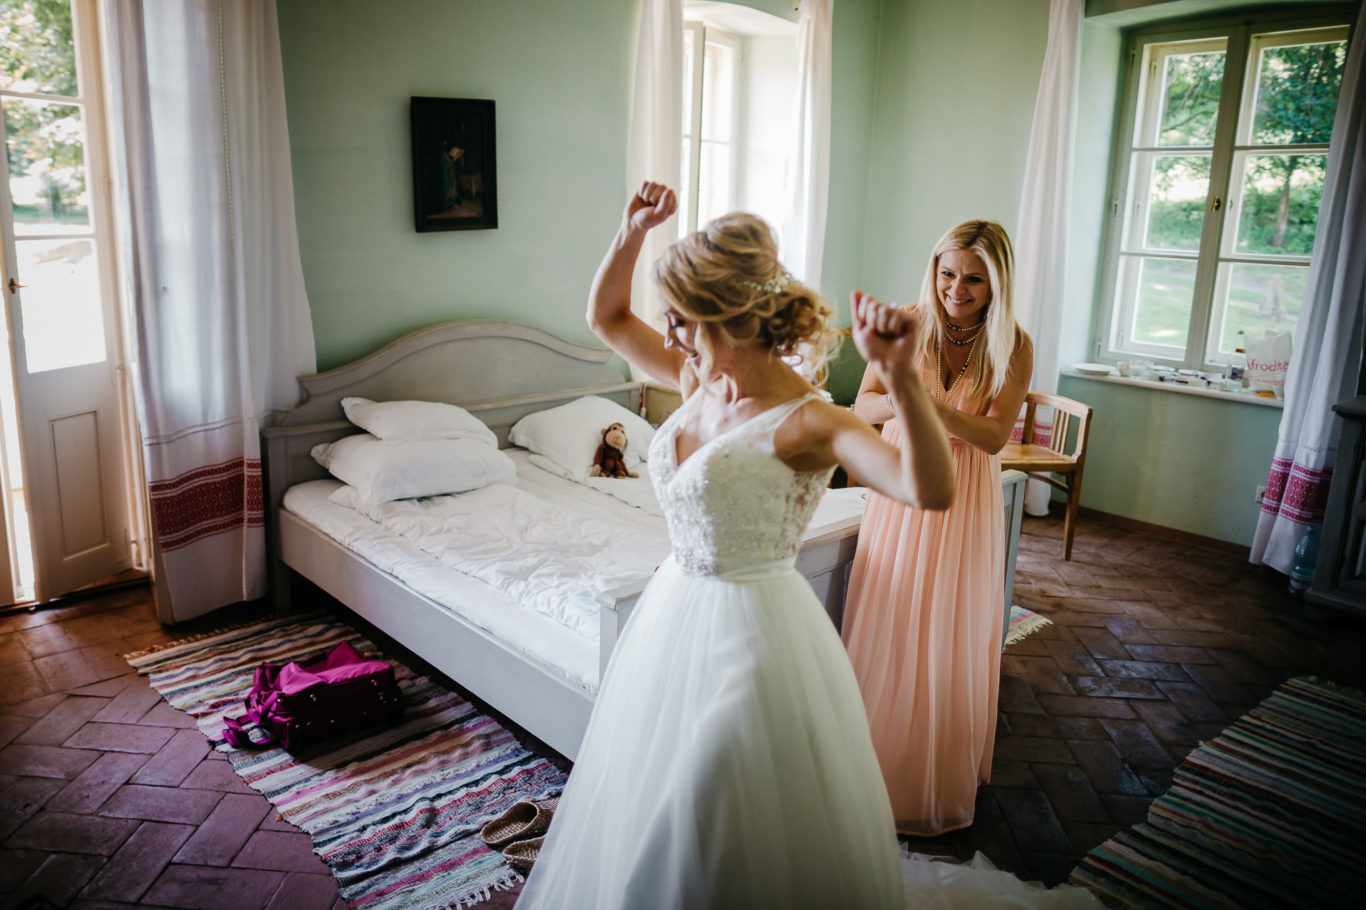 0106-fotografie-nunta-conacul-apafi-ana-simion-fotograf-ciprian-dumitrescu-cd2_0150